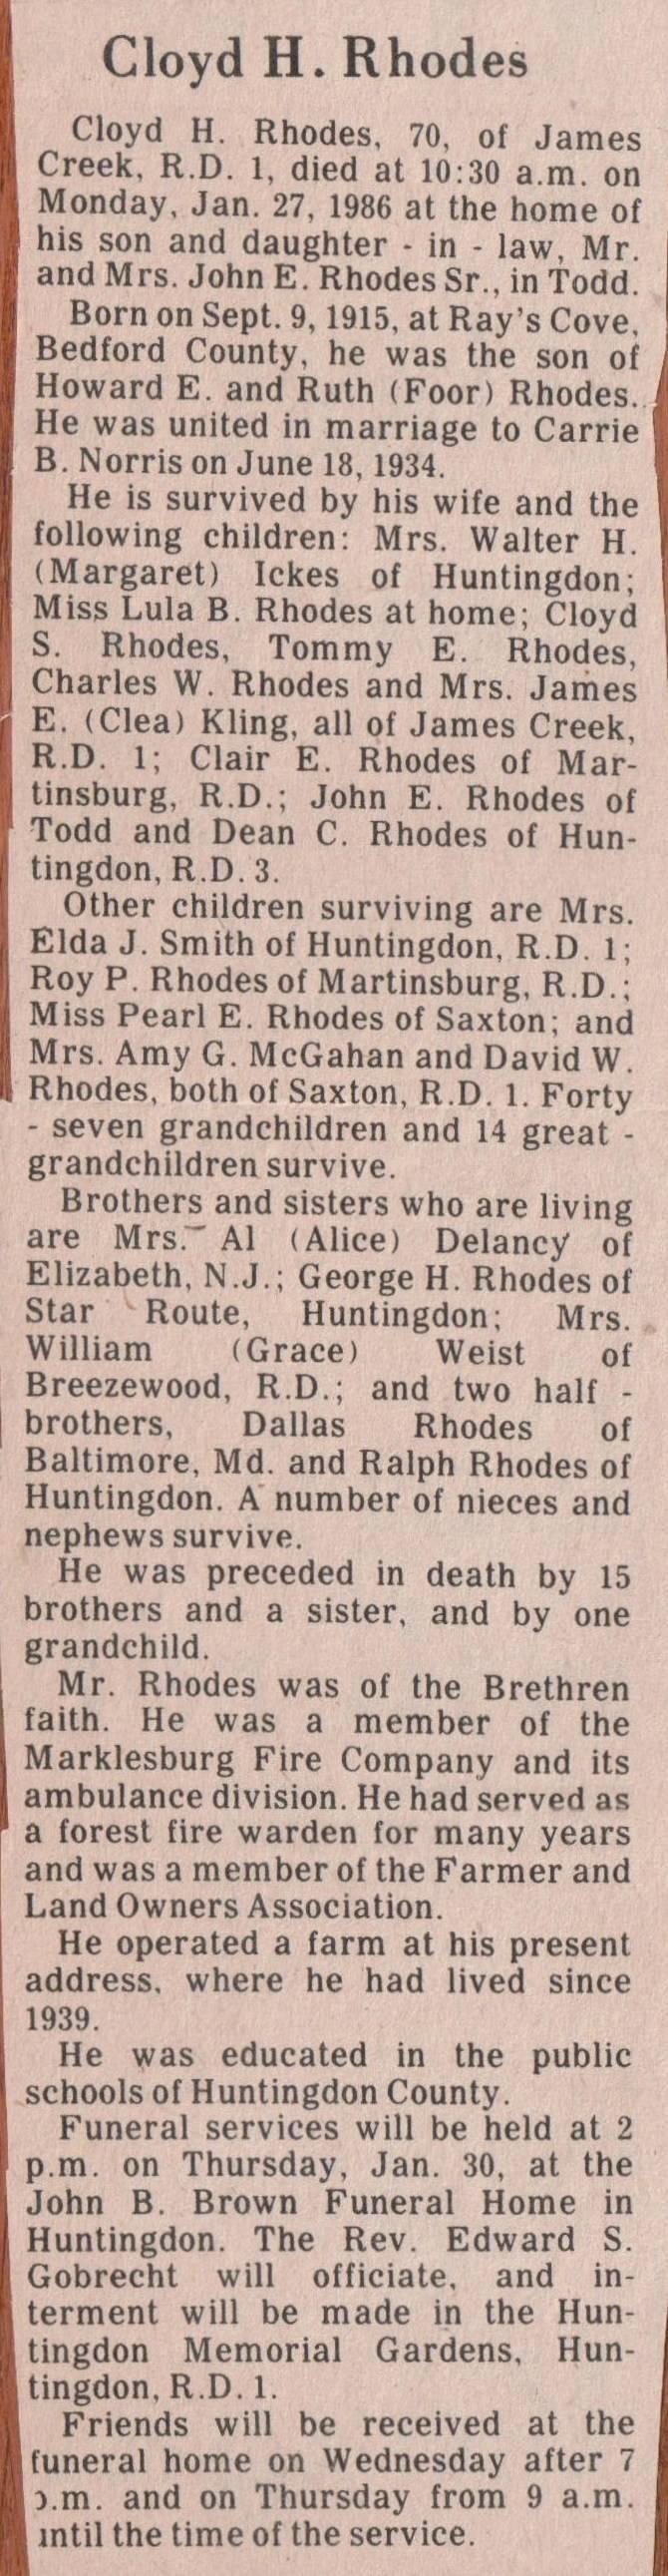 Rhodes, Cloyd H. 1986